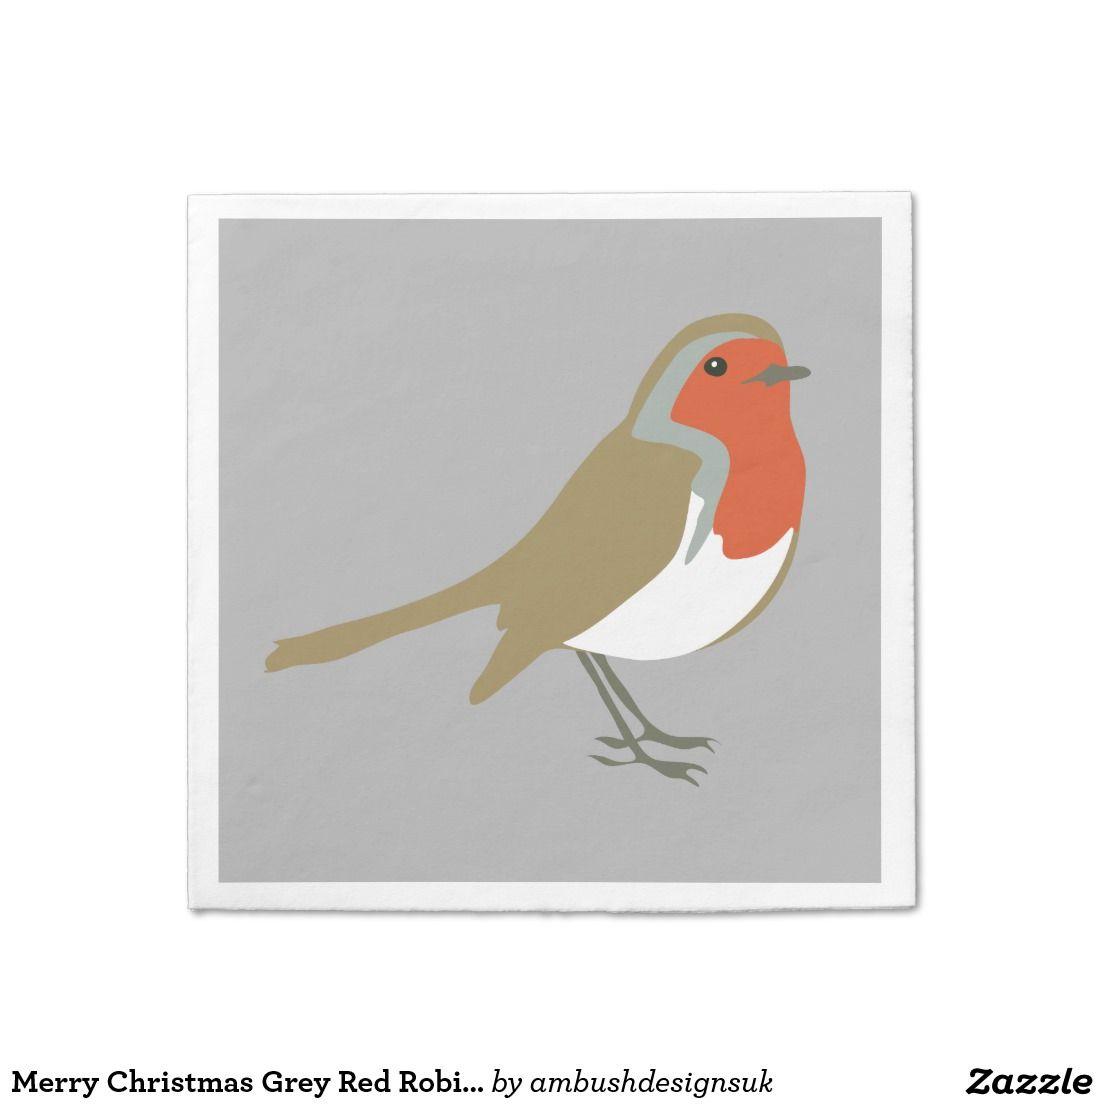 merry christmas grey red robin napkins serviettes paper serviettes - Is Red Robin Open On Christmas